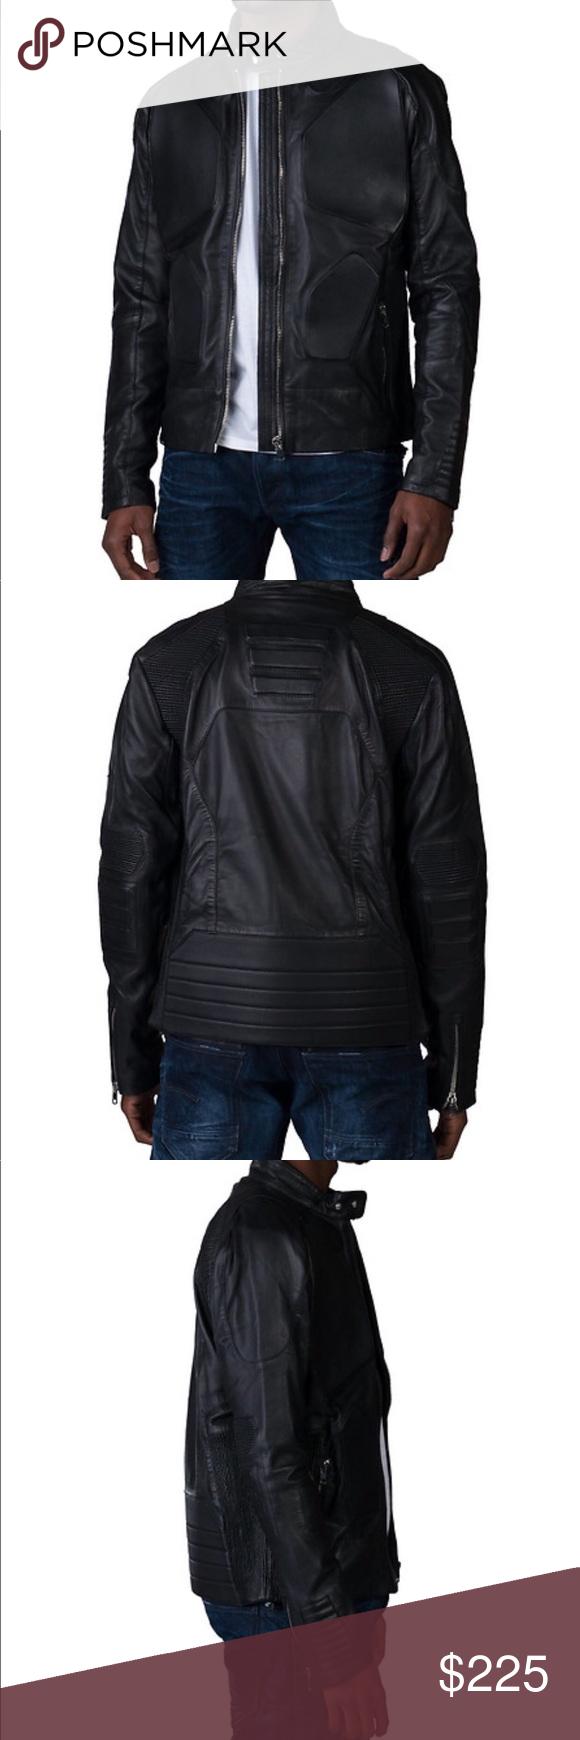 Hudson Outerwear Black Leather Moto Jacket Men S Men S Hudson Outerwear Black Leather Moto Jac Black Leather Moto Jacket Outerwear Jackets Leather Jacket Men [ 1740 x 580 Pixel ]